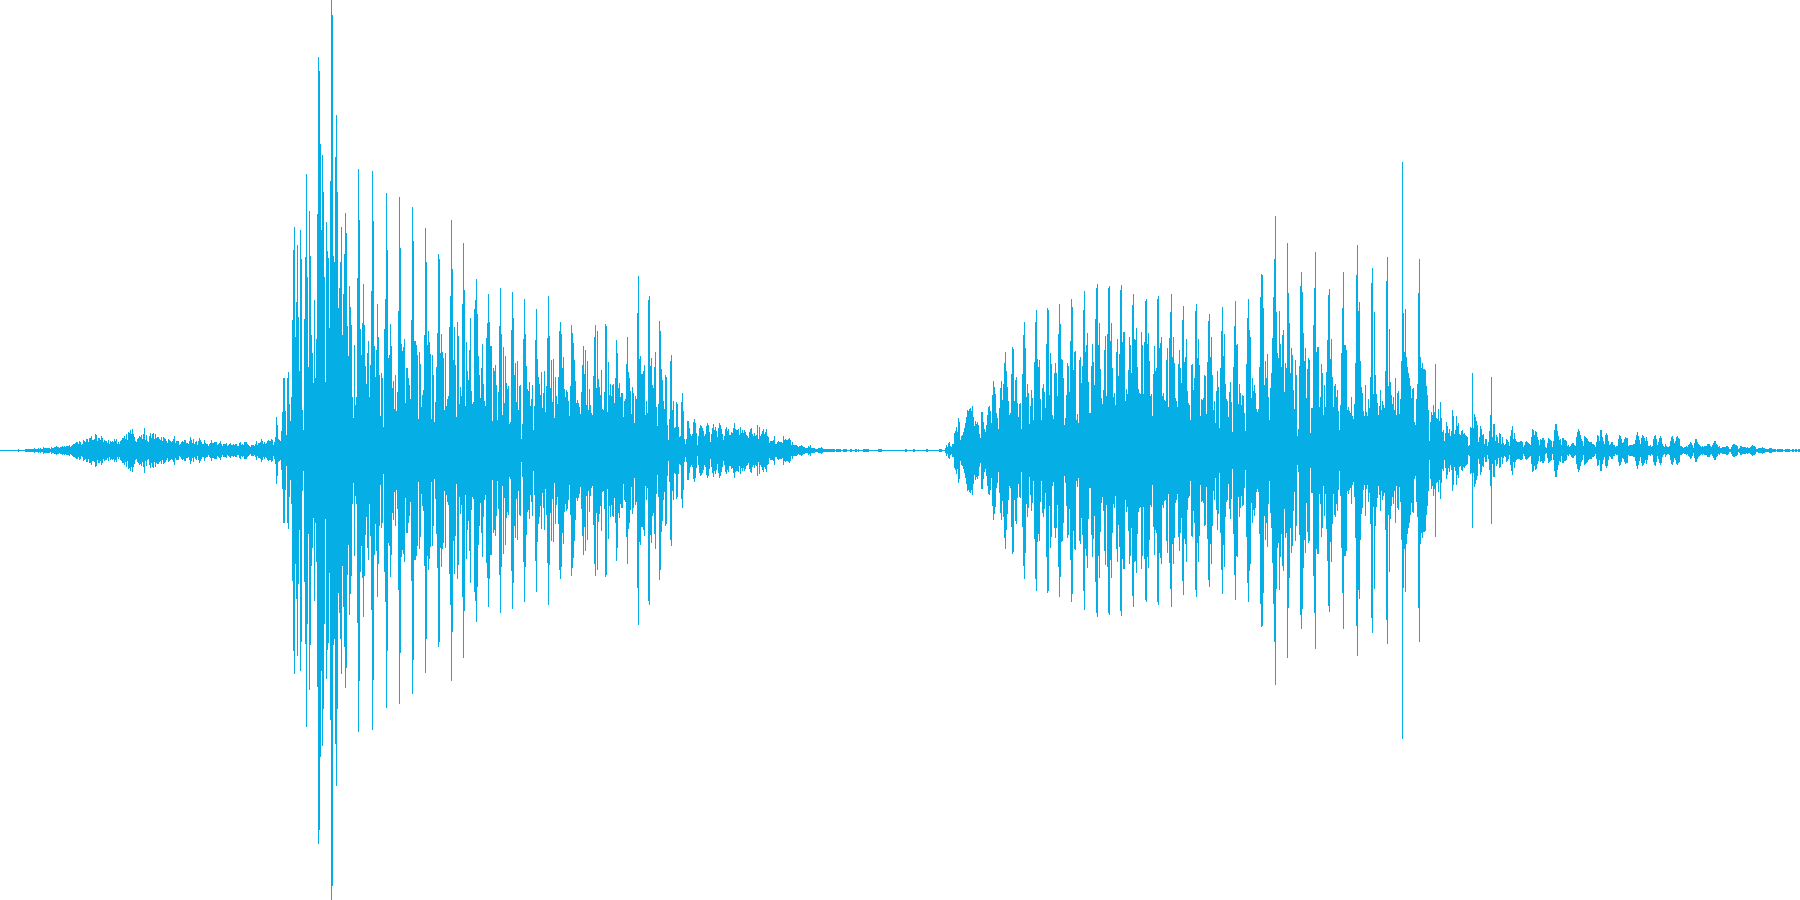 「5 PM」英語発音の再生済みの波形